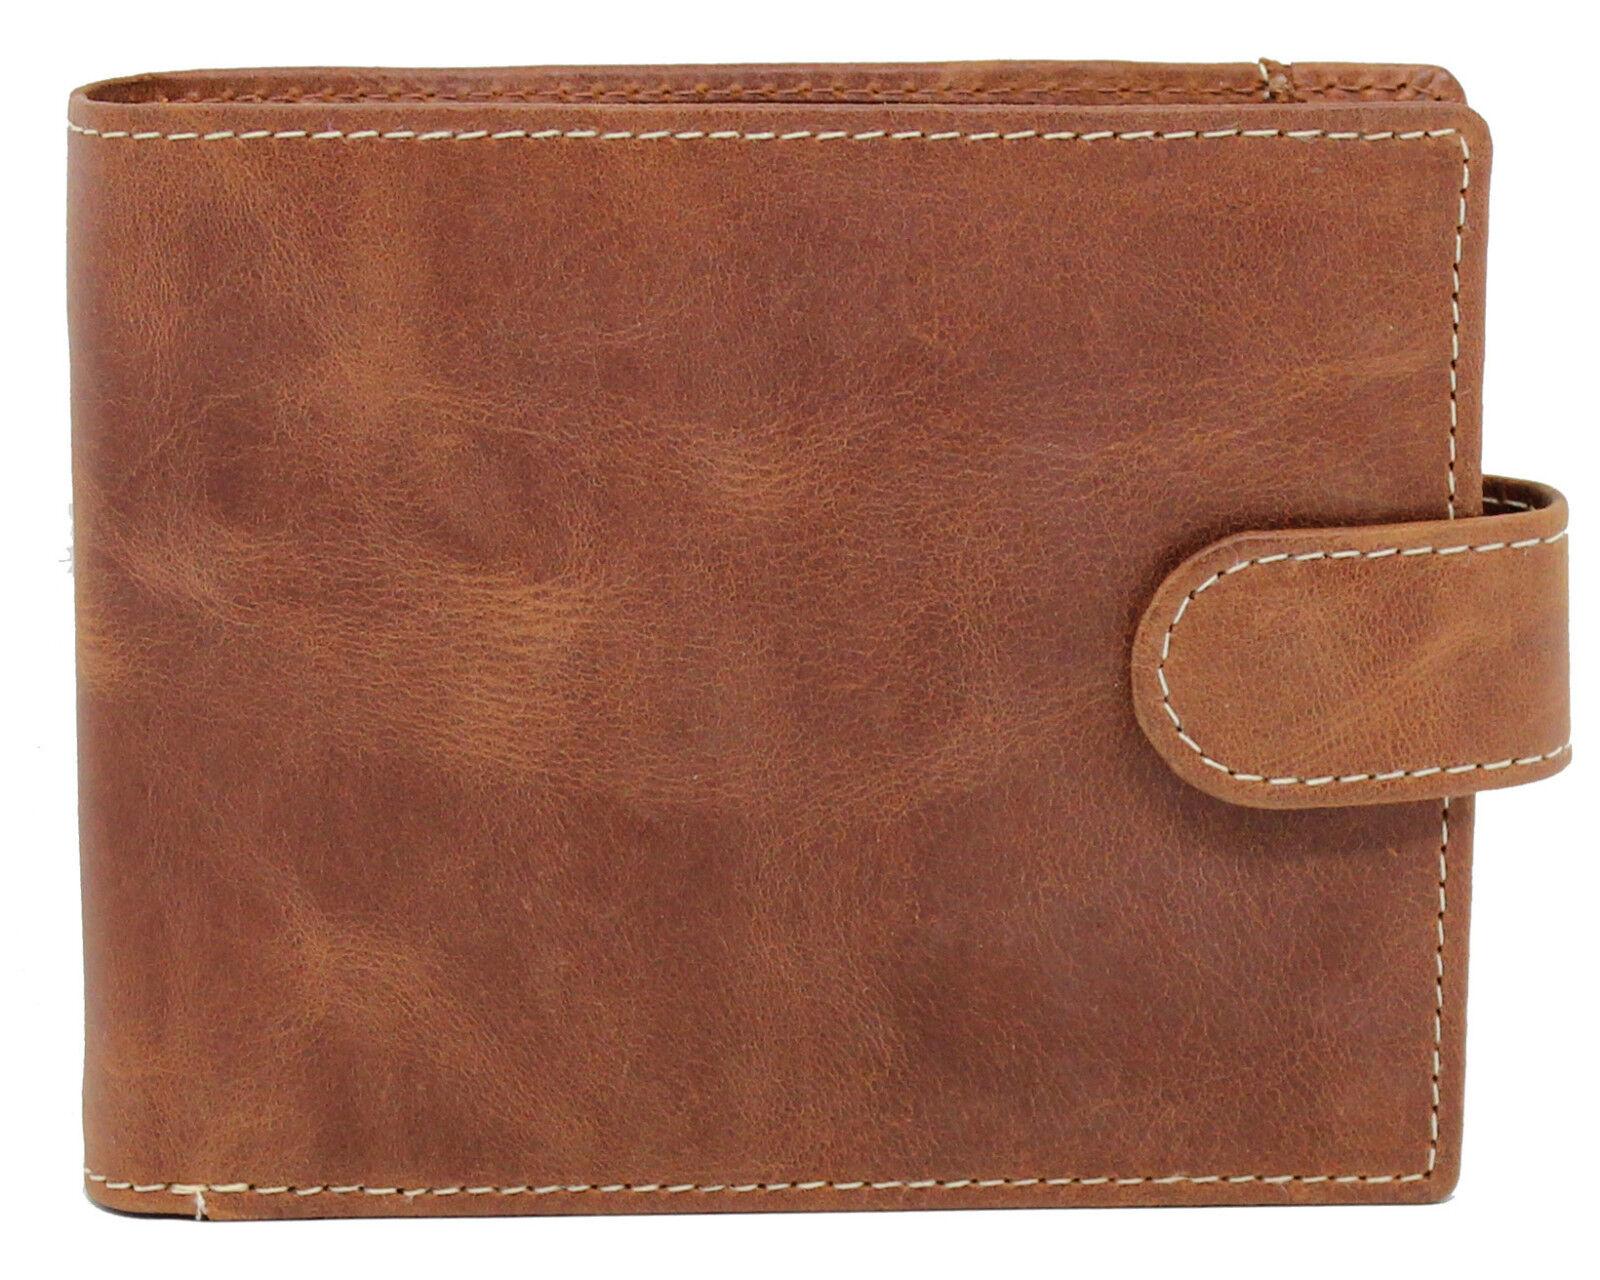 Mens Designer RFID Blocking Quality Brown Distressed Crunch Leather Wallet 4021